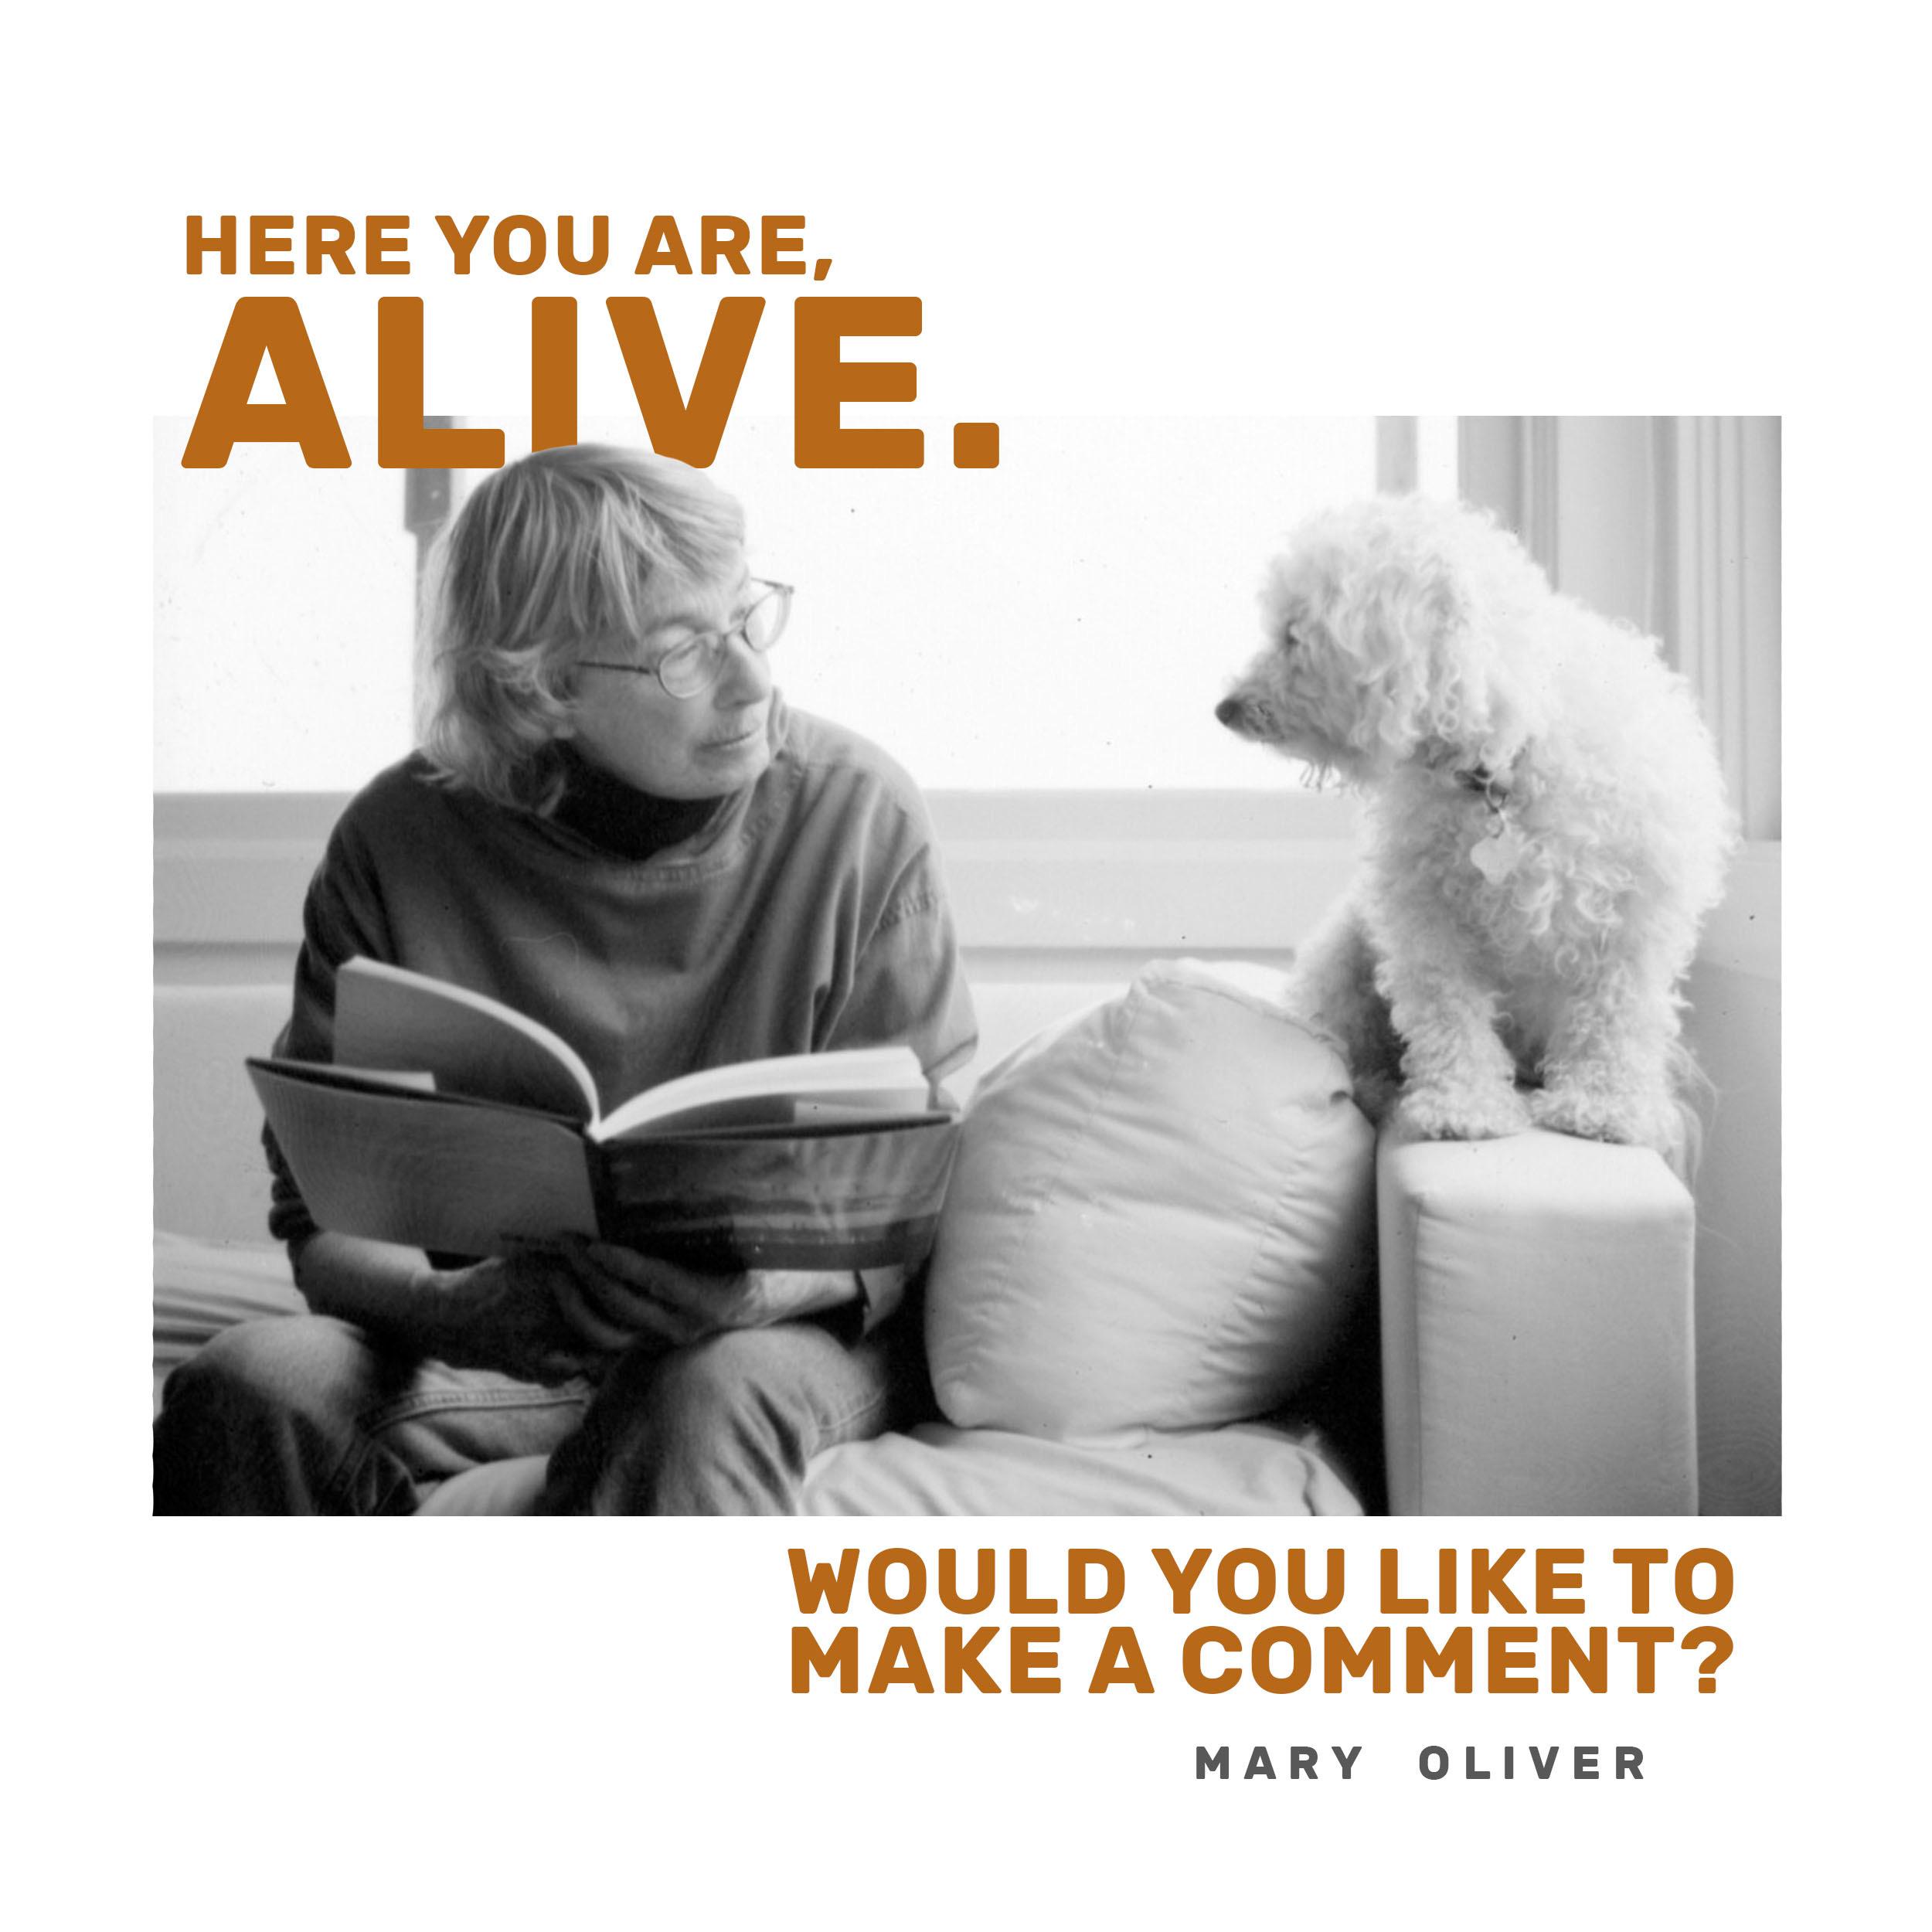 16 Mary Oliver.JPG